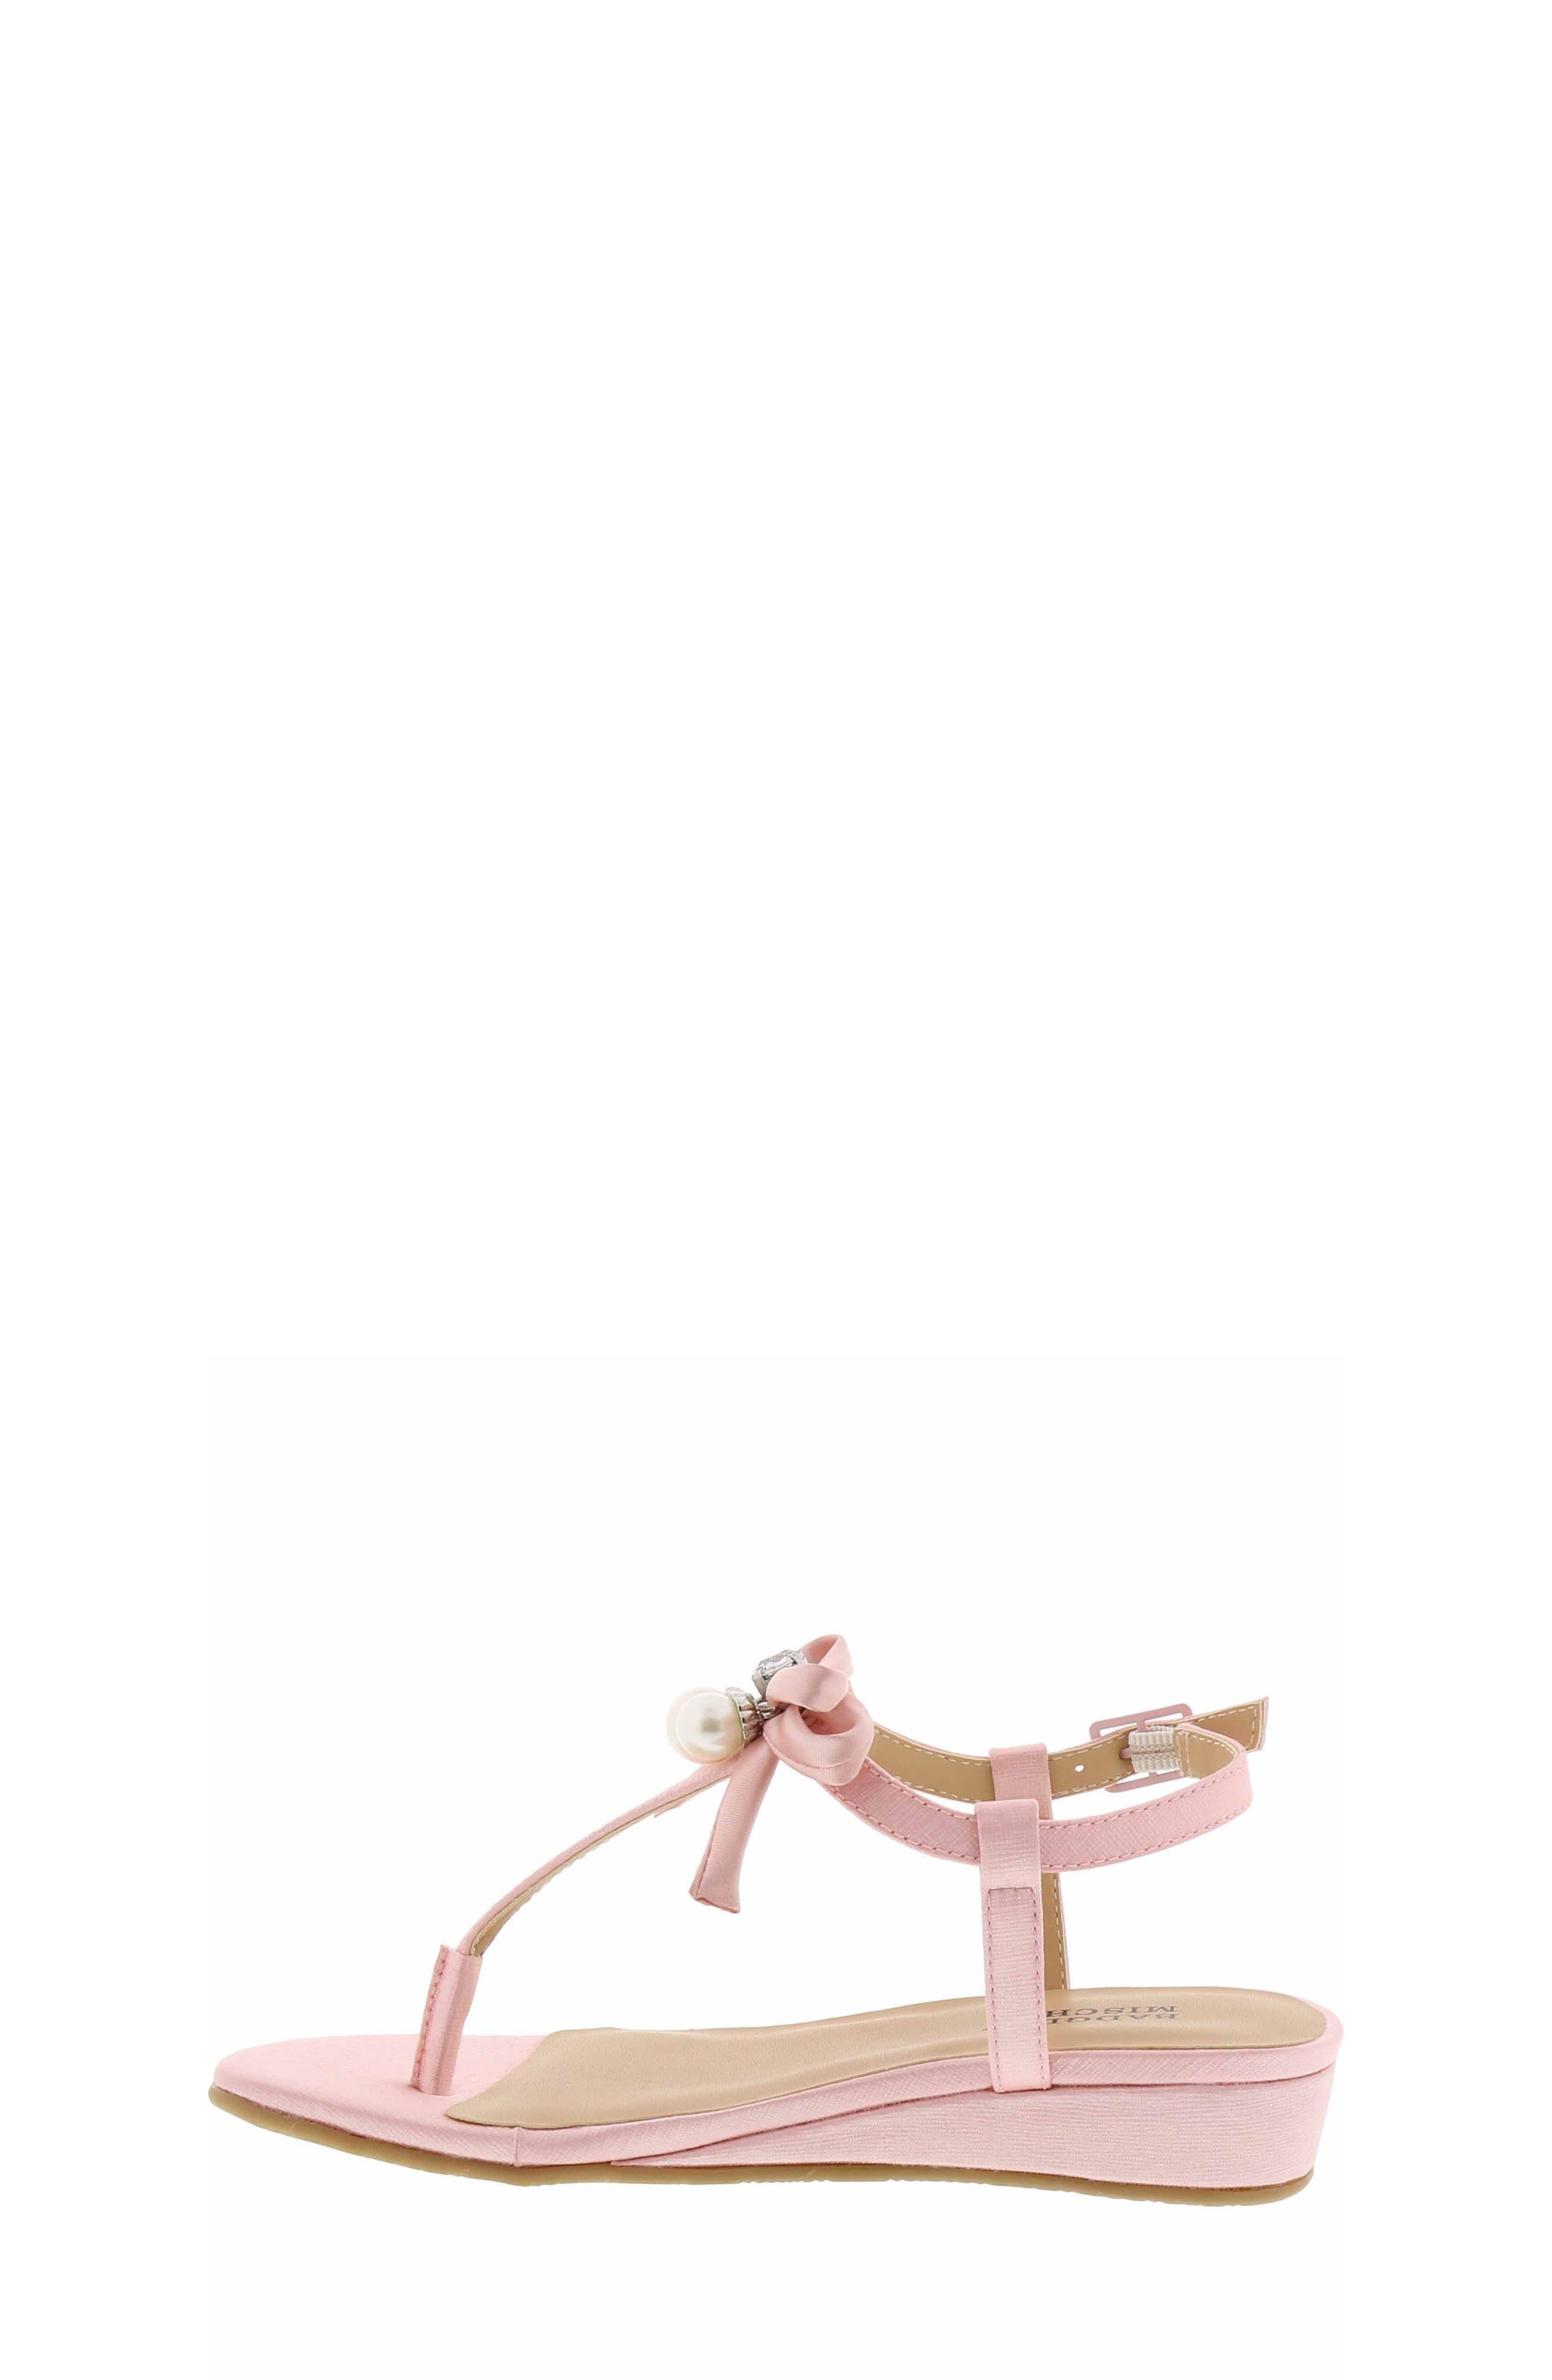 Talia Embellished Bow Sandal,                             Alternate thumbnail 3, color,                             Light Pink